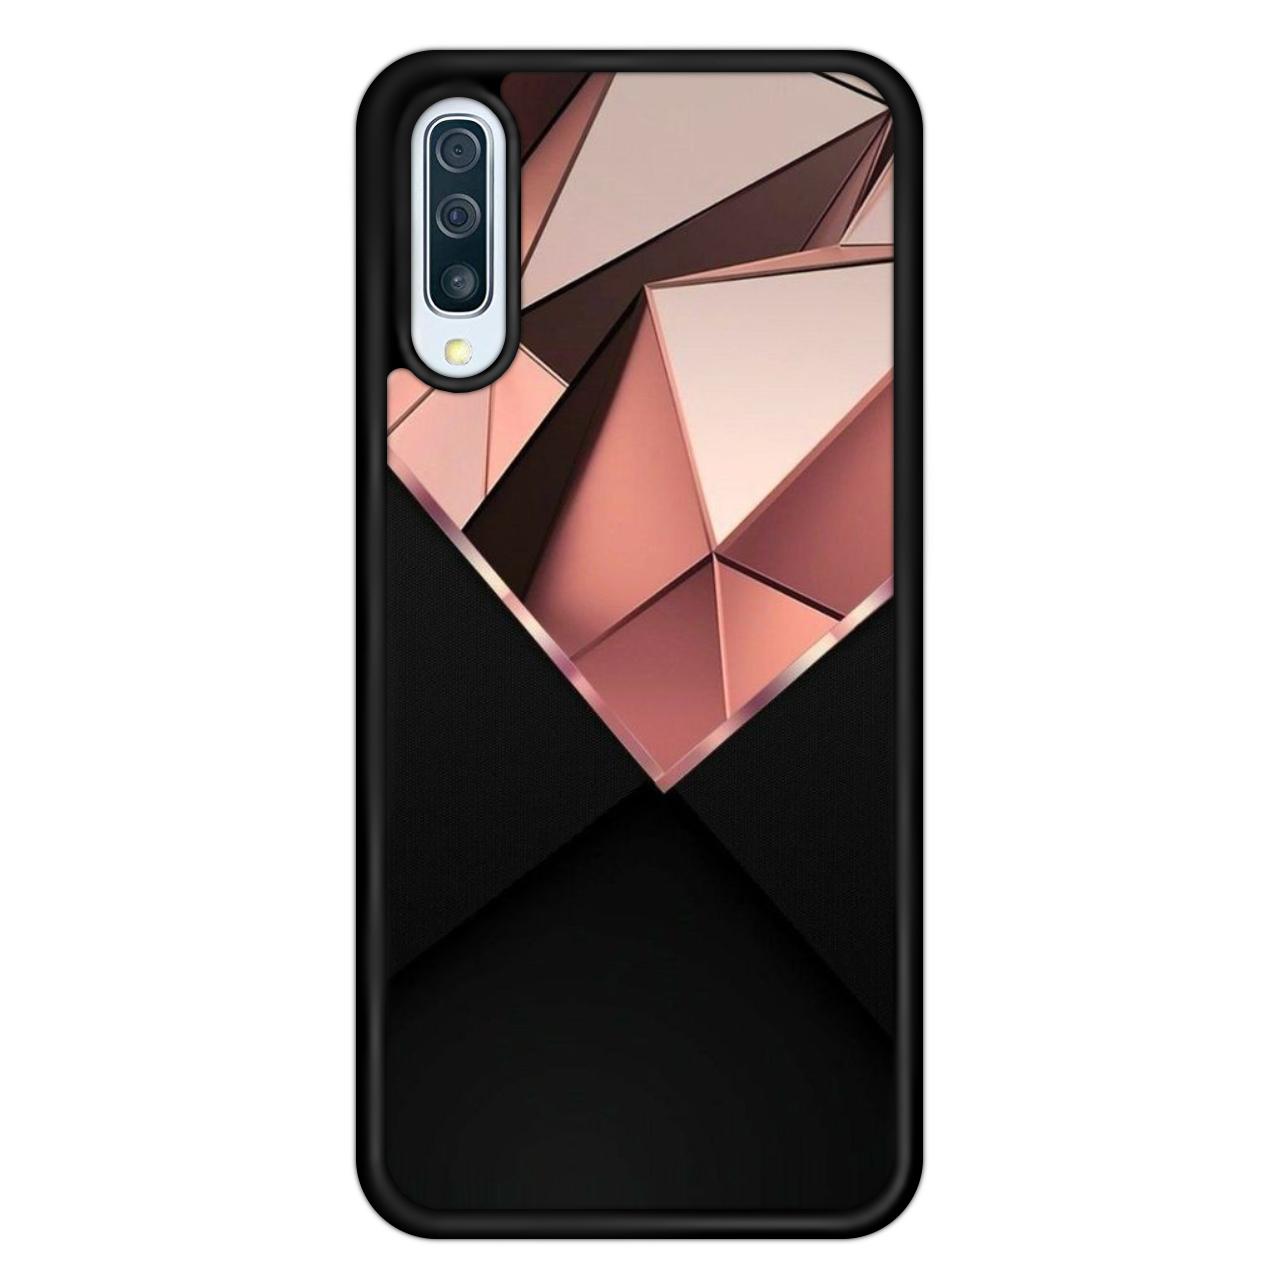 کاور آکام مدل Aa501581 مناسب برای گوشی موبایل سامسونگ Galaxy A50